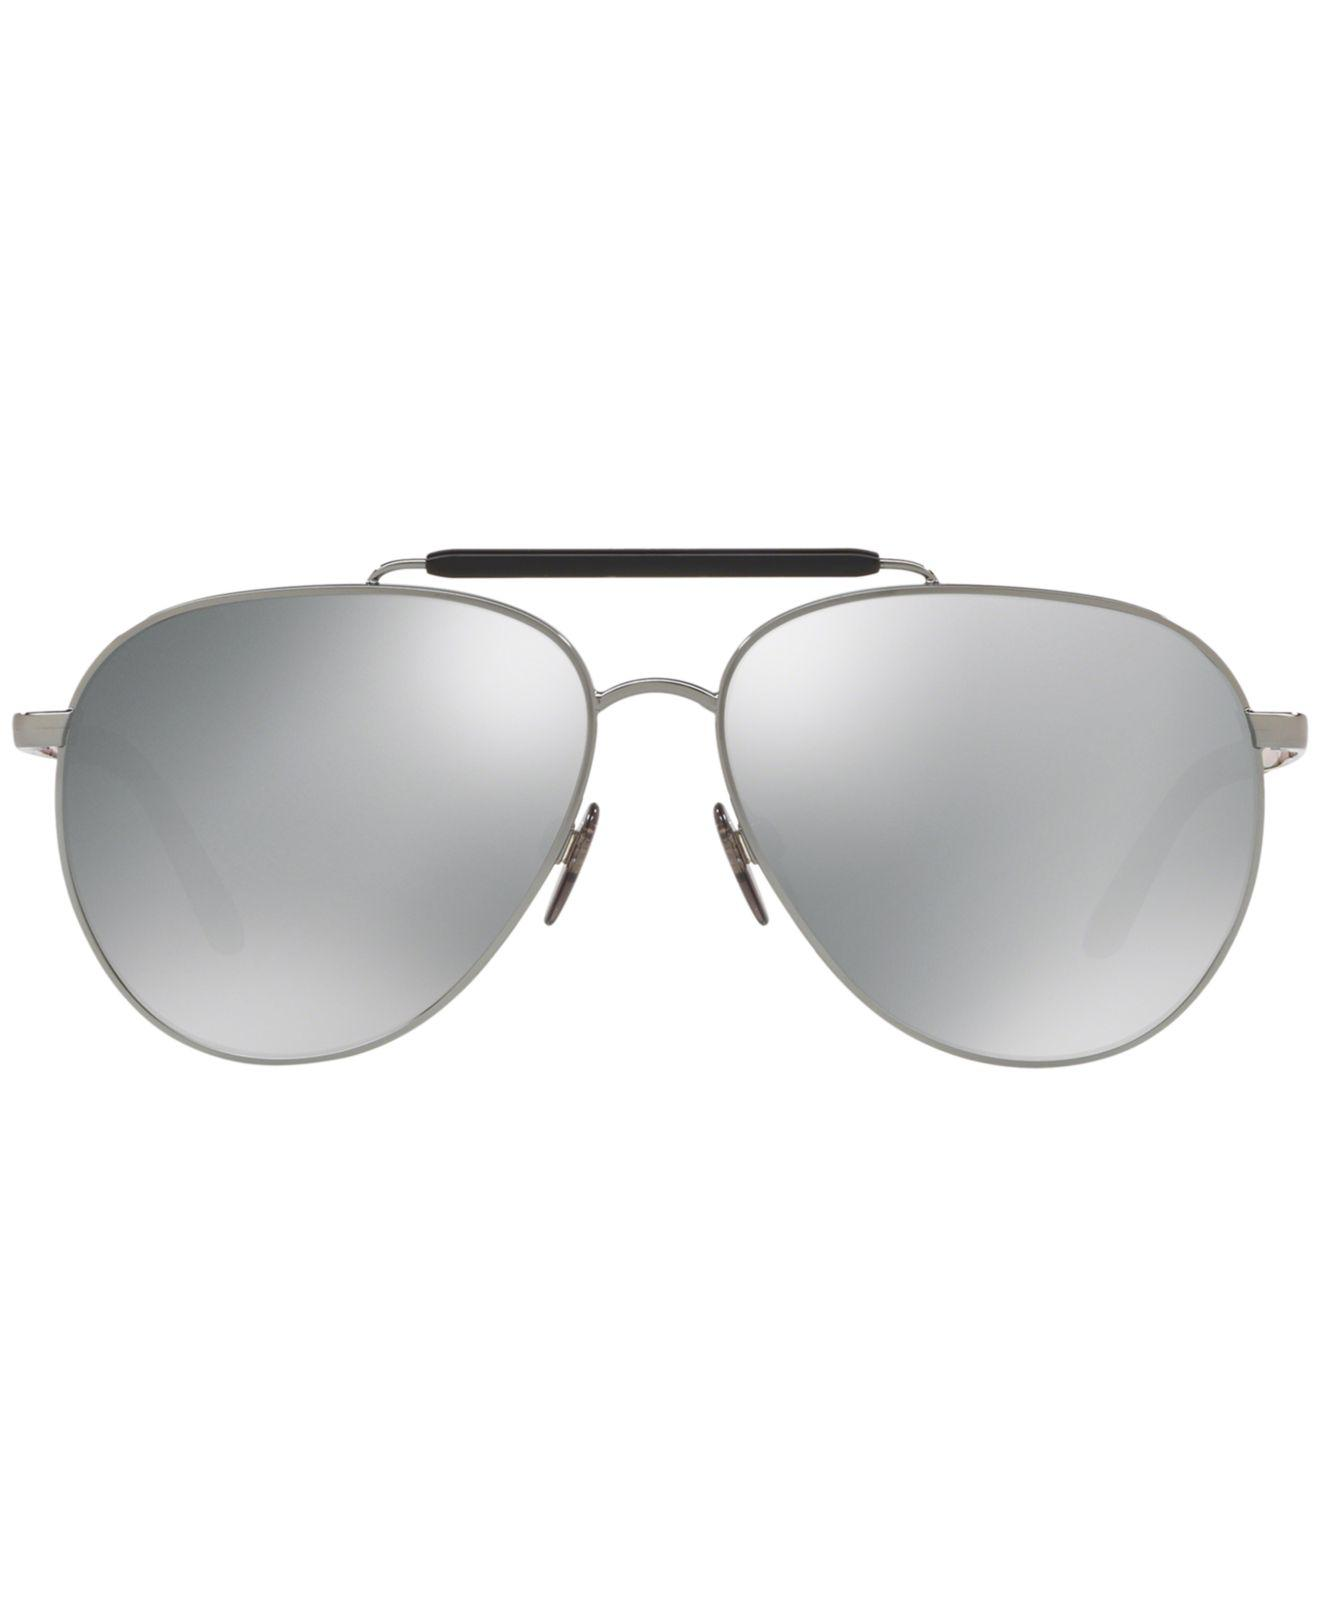 cee54dcaeef Lyst - Burberry Polarized Sunglasses